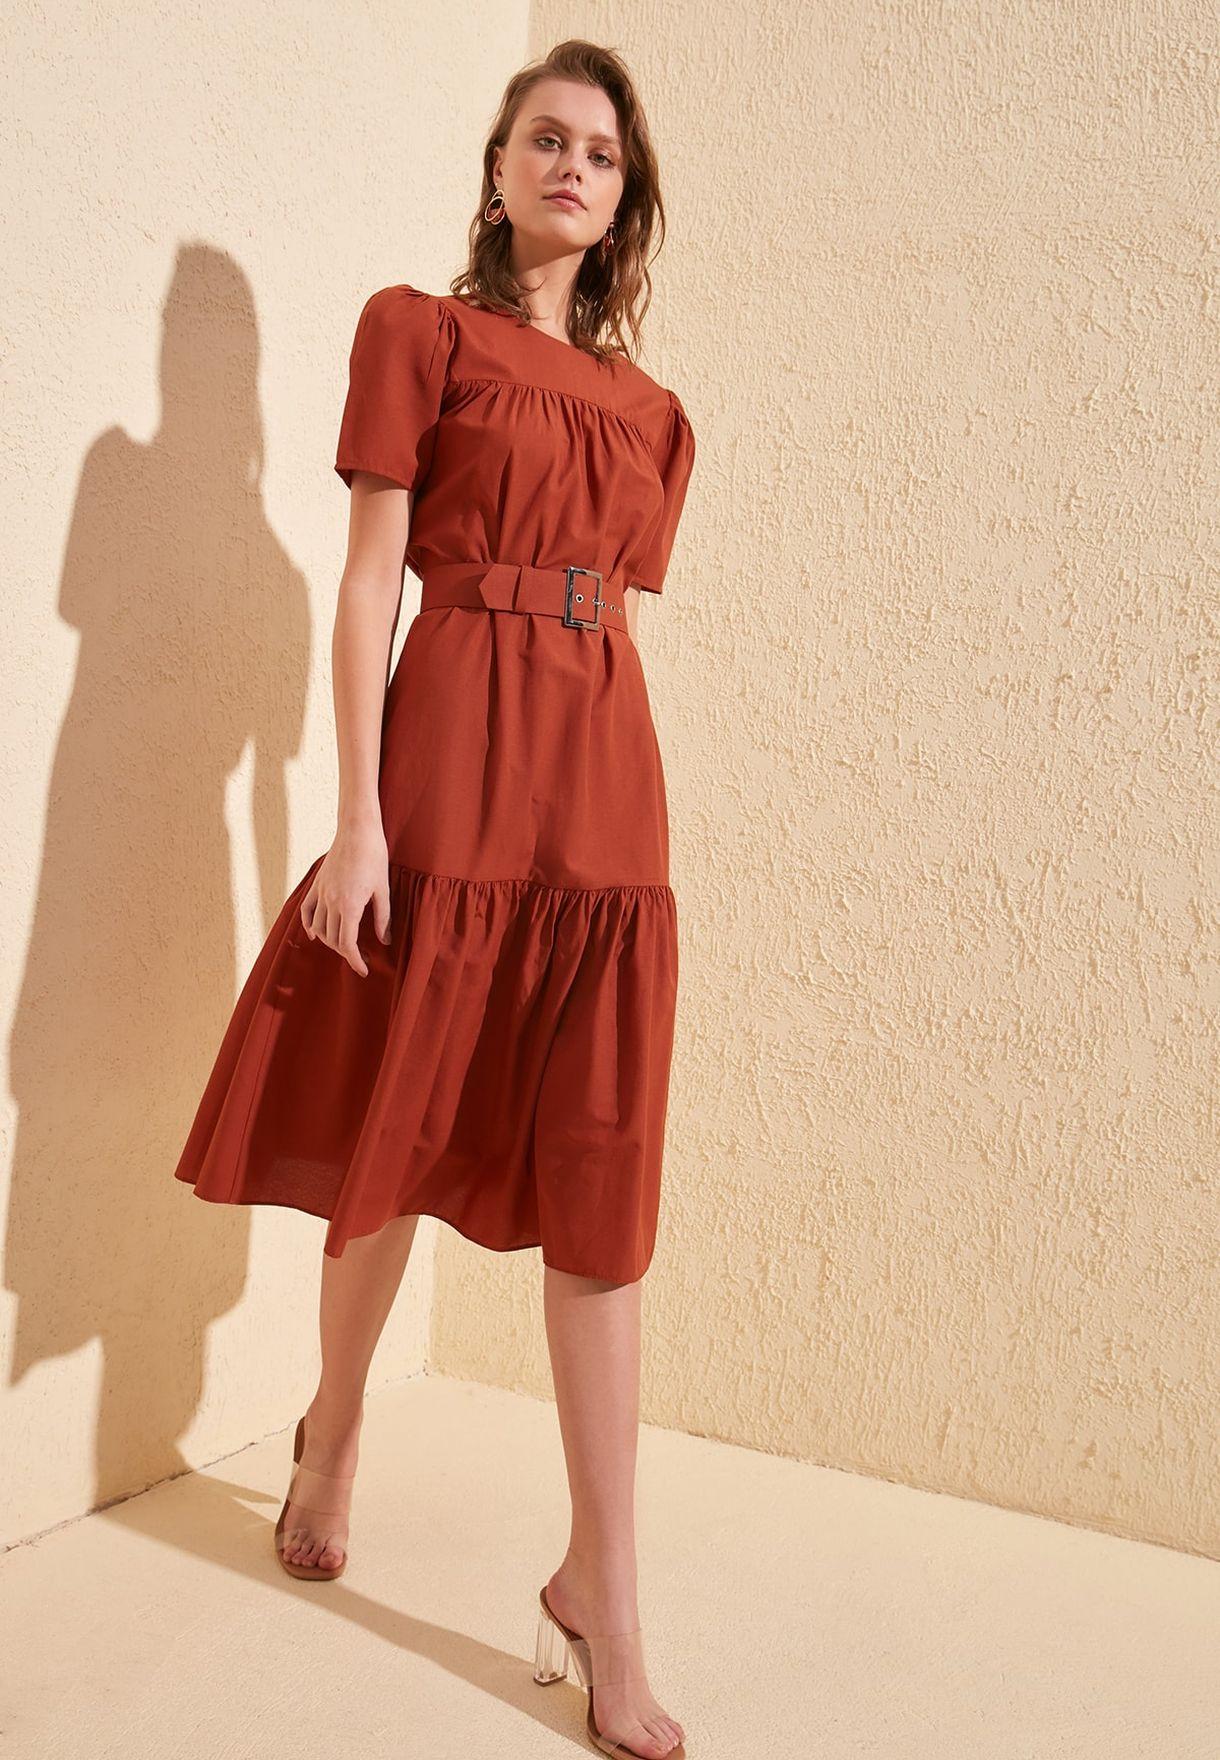 Tiered Hem Puff Sleeve Dress